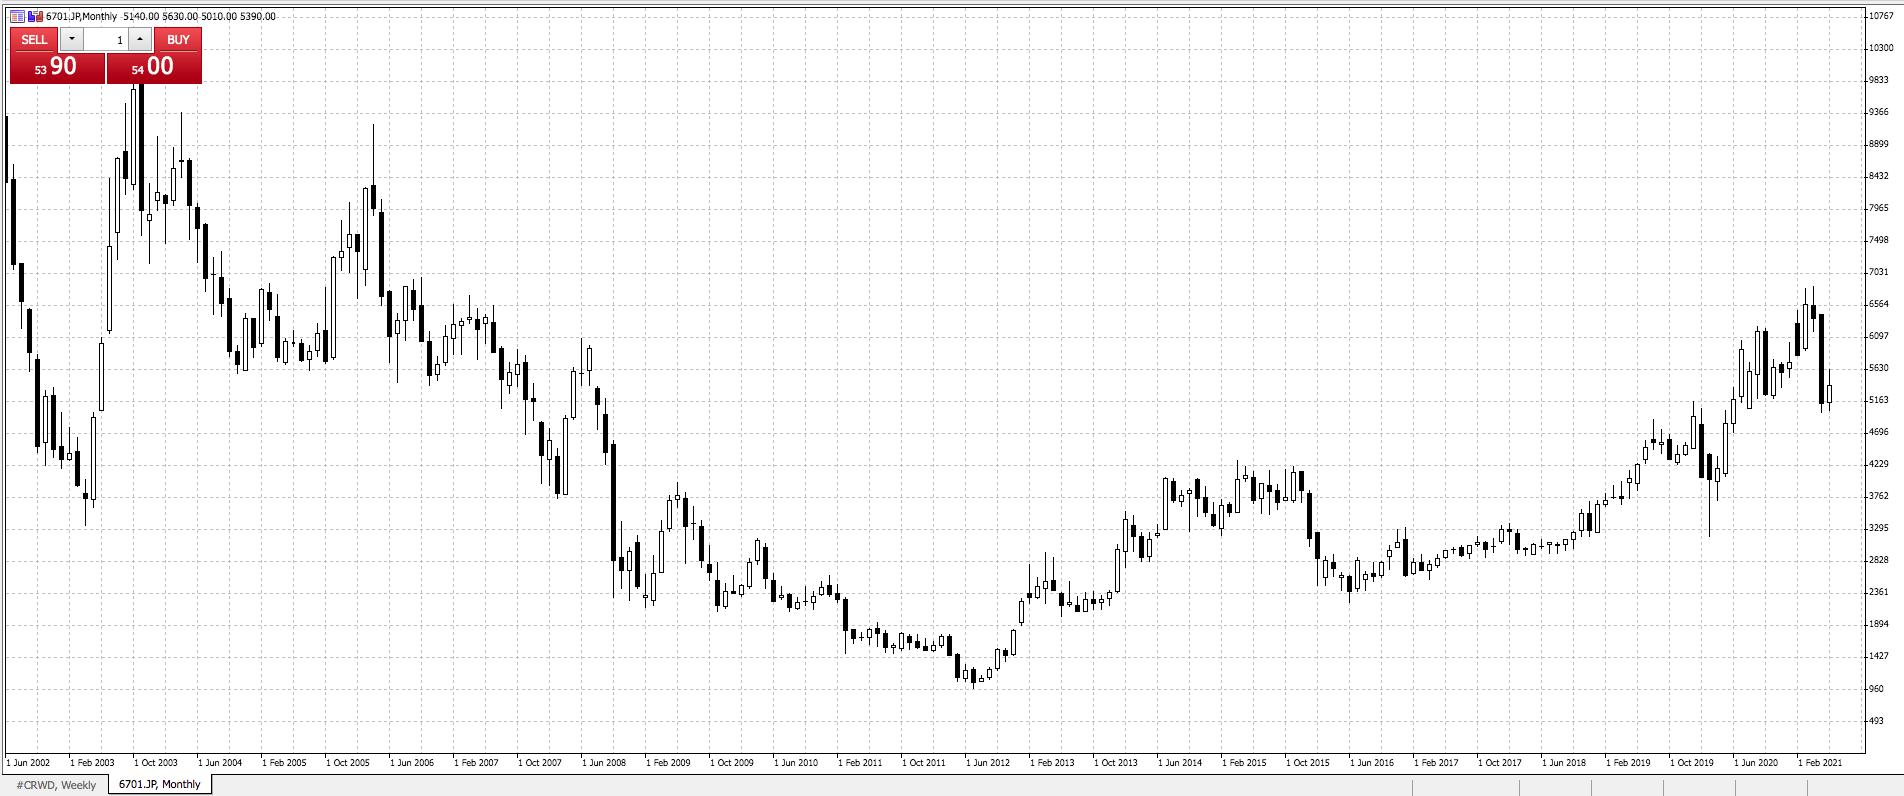 NEC Corp Olympic Stocks